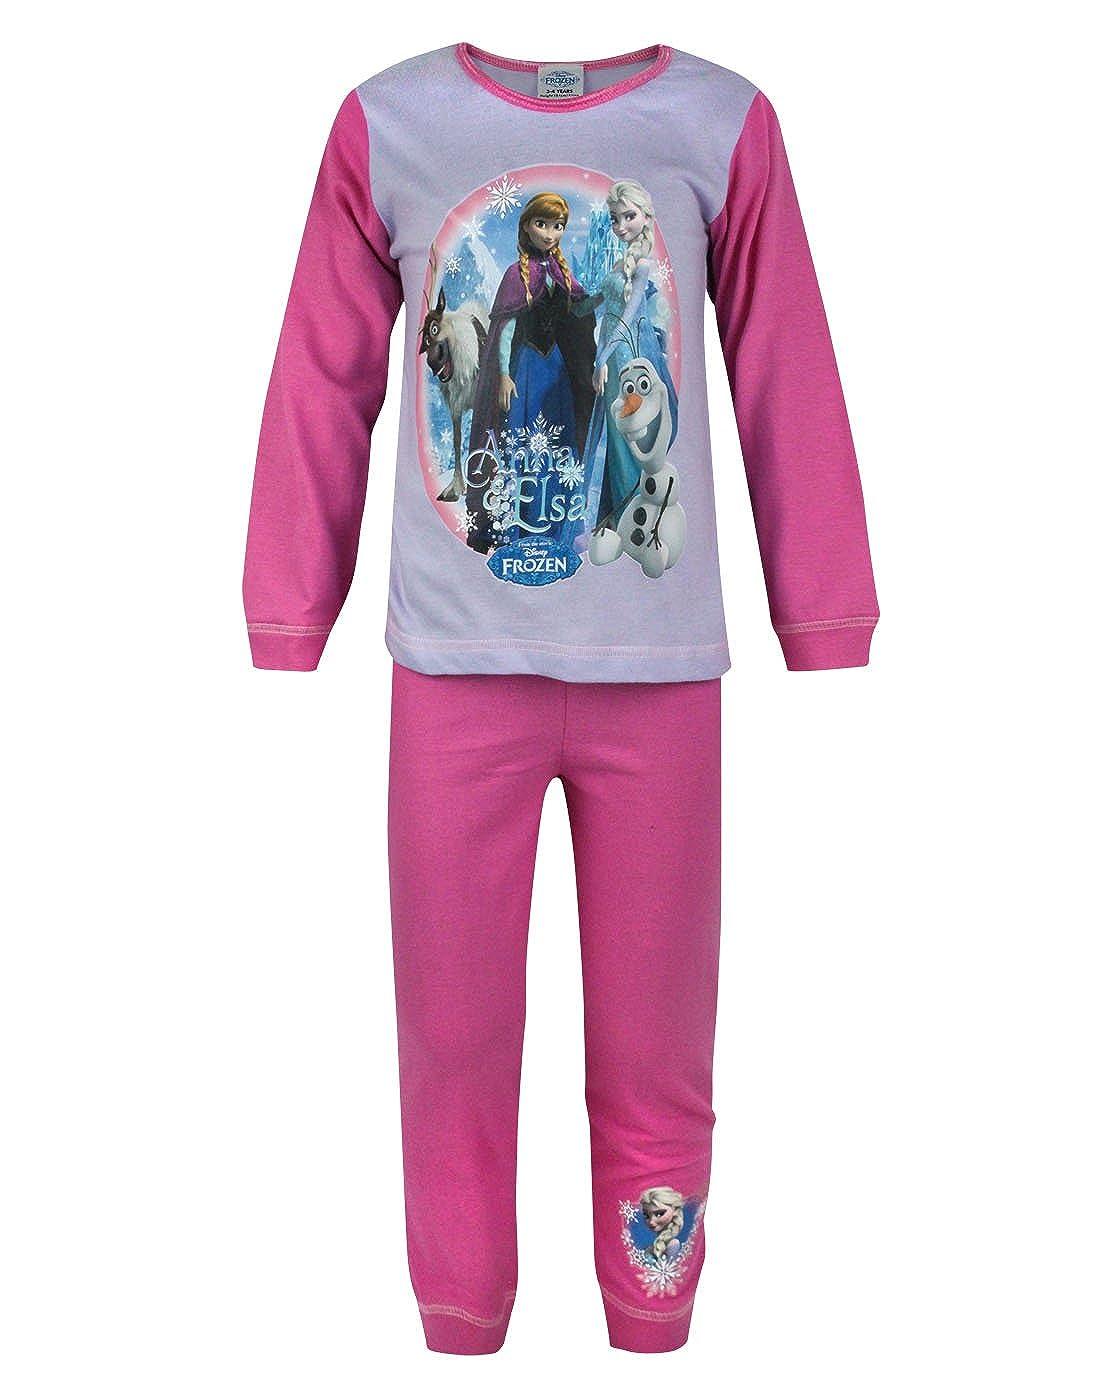 Official Frozen Anna And Elsa Girl's Pyjamas